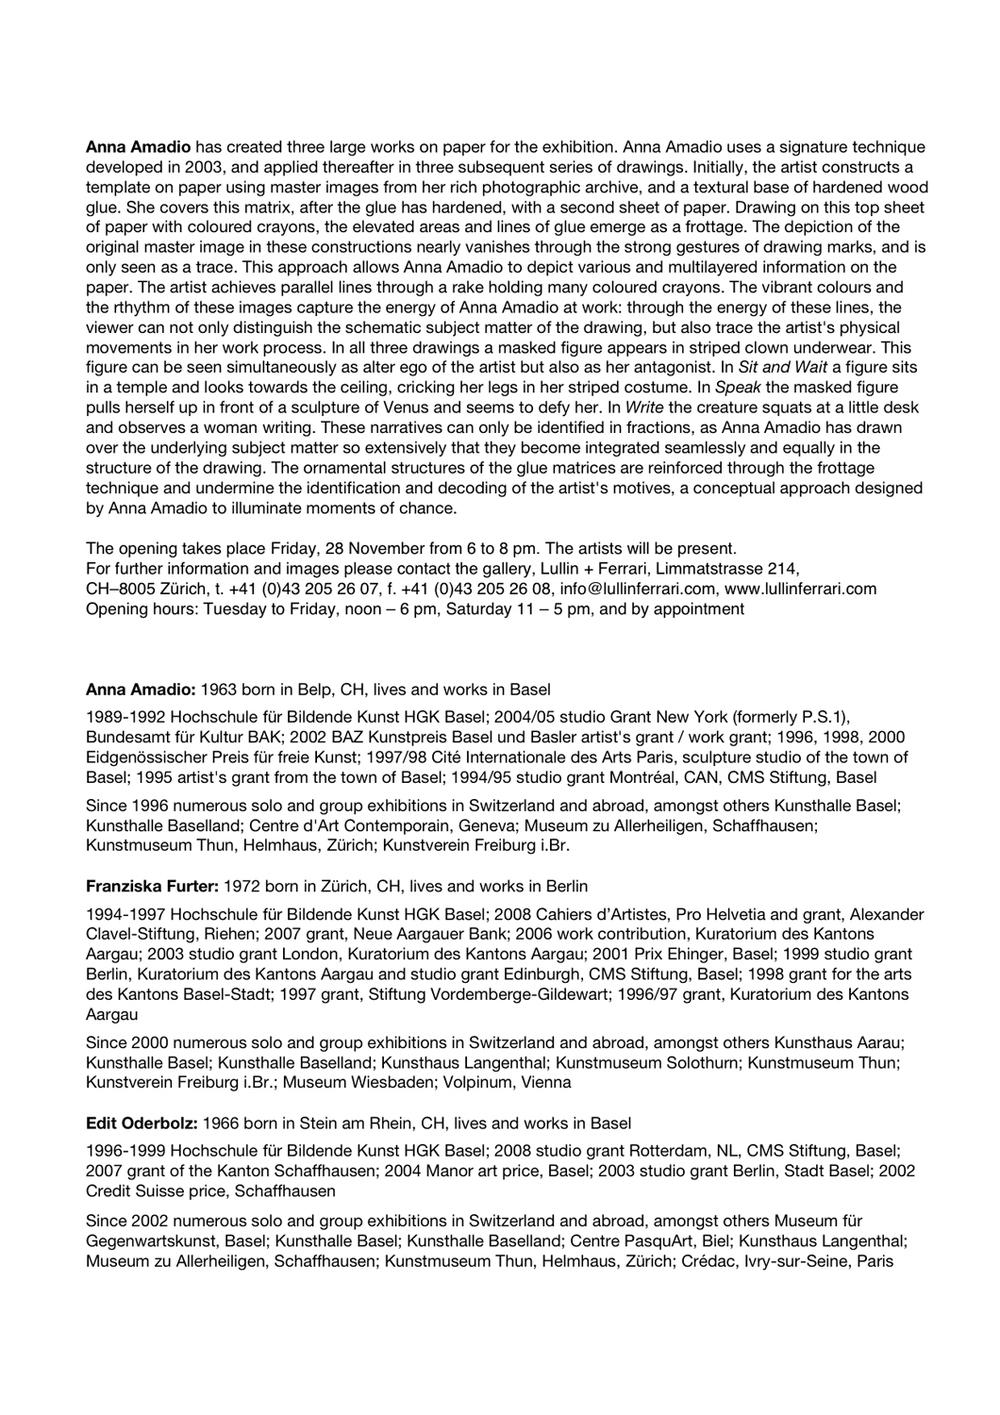 franziska furter LullinFerrariPress Traces2 E.jpg